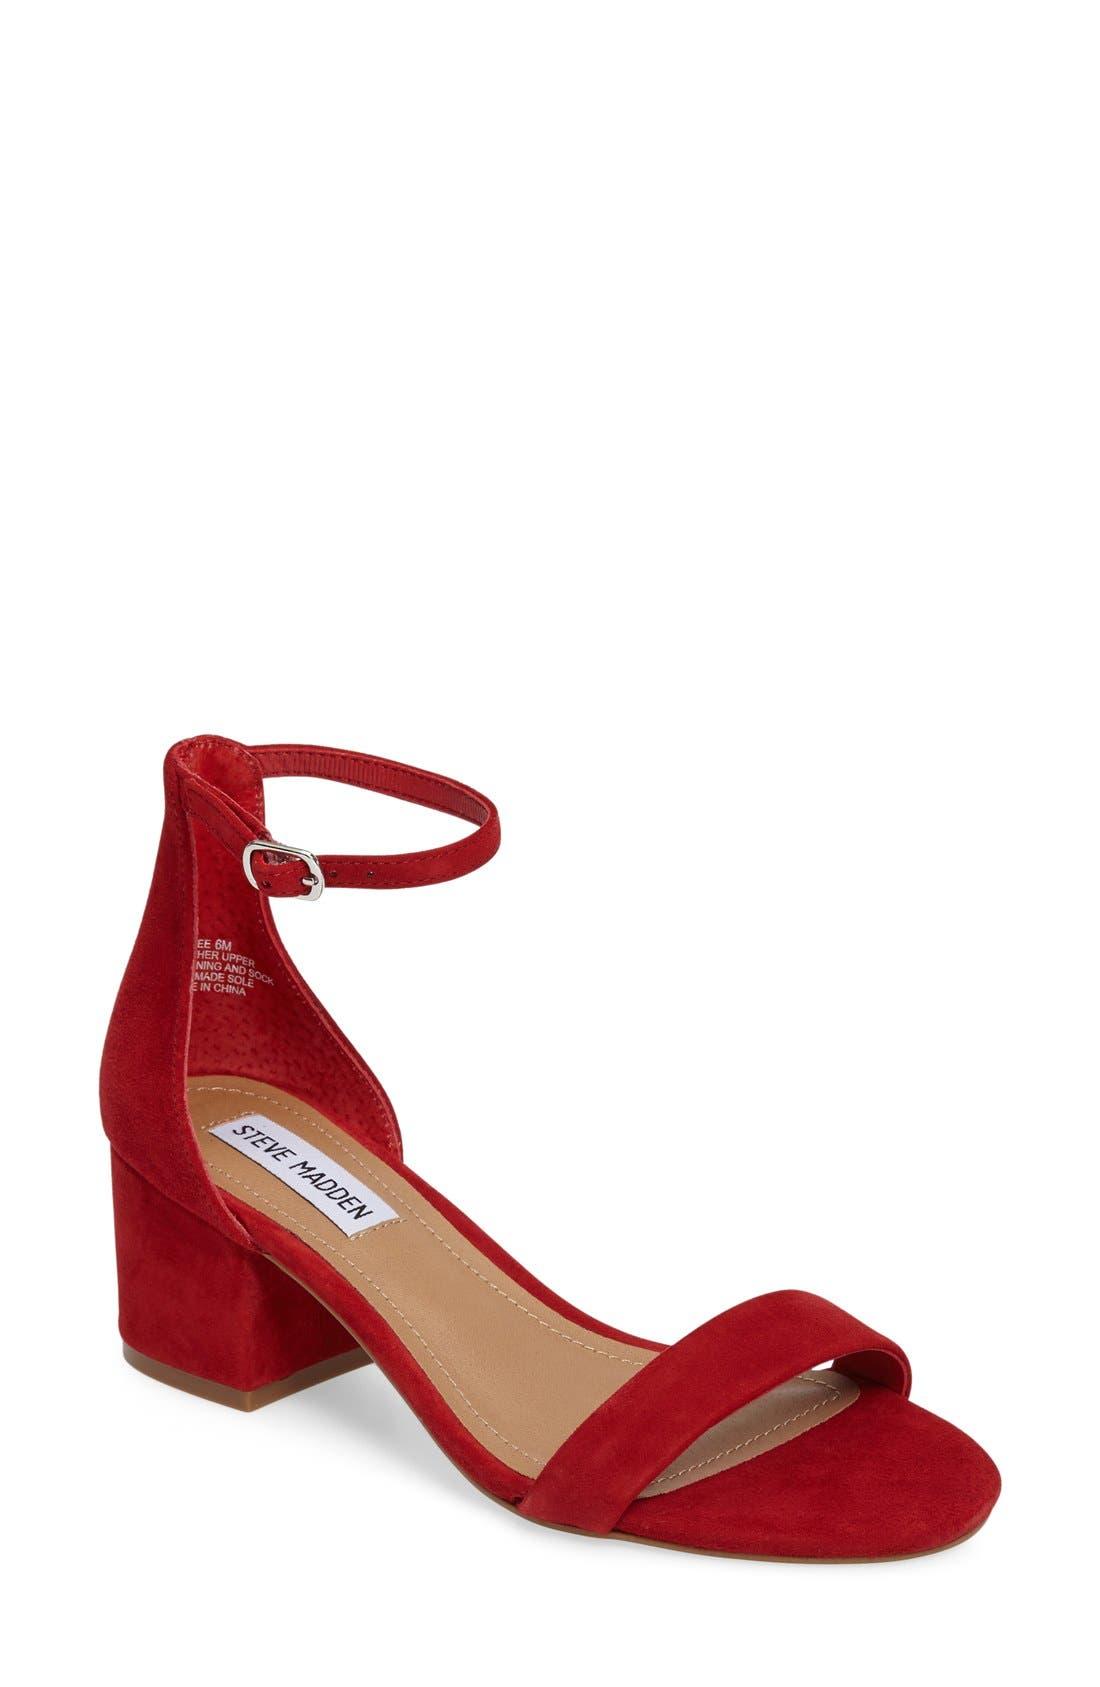 Irenee Ankle Strap Sandal,                             Main thumbnail 24, color,